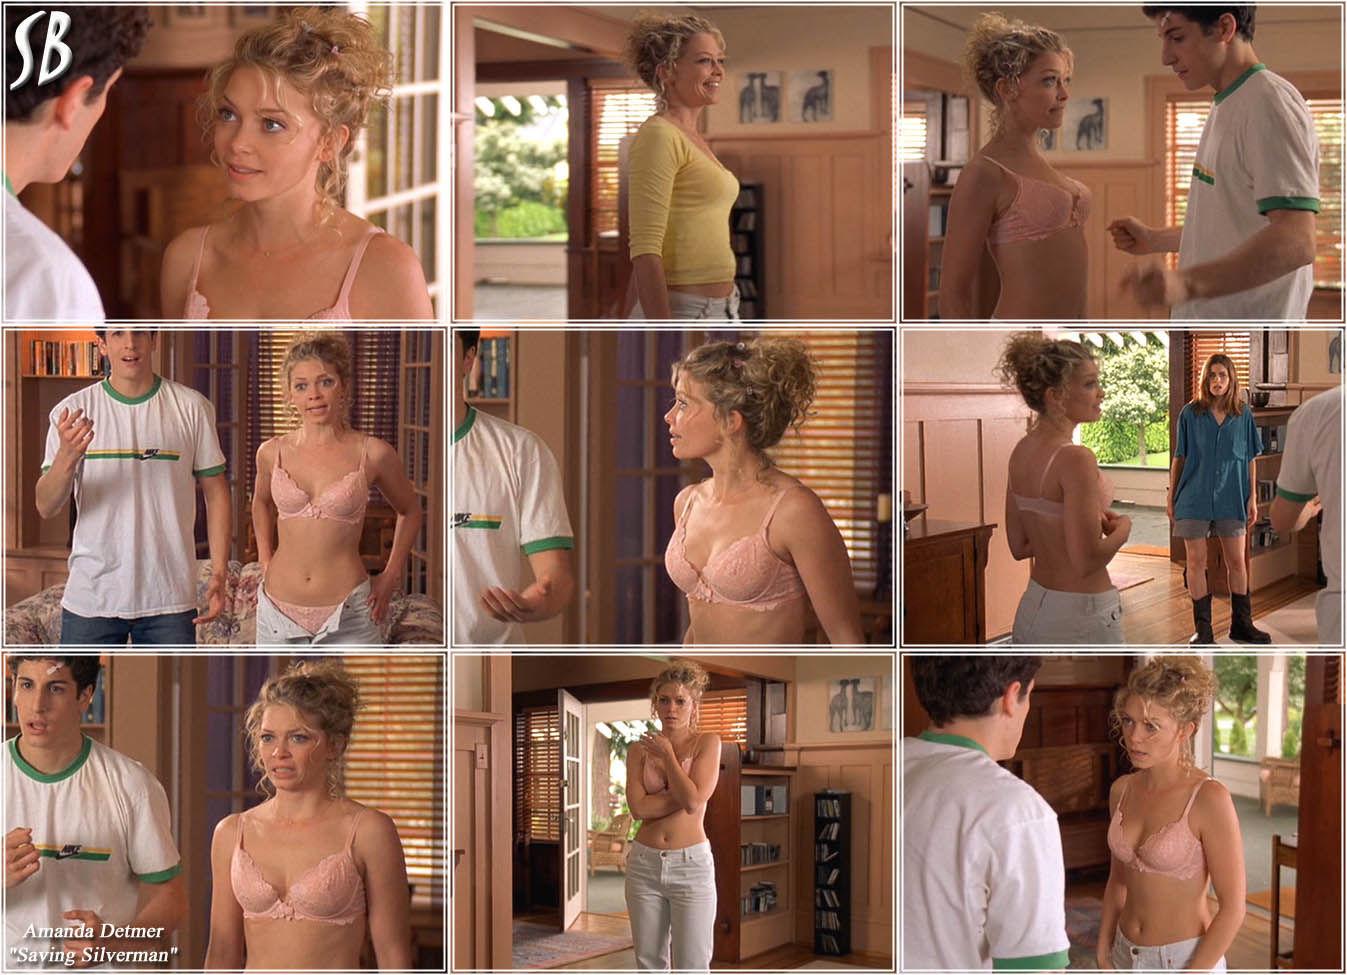 amanda detmer naked pics